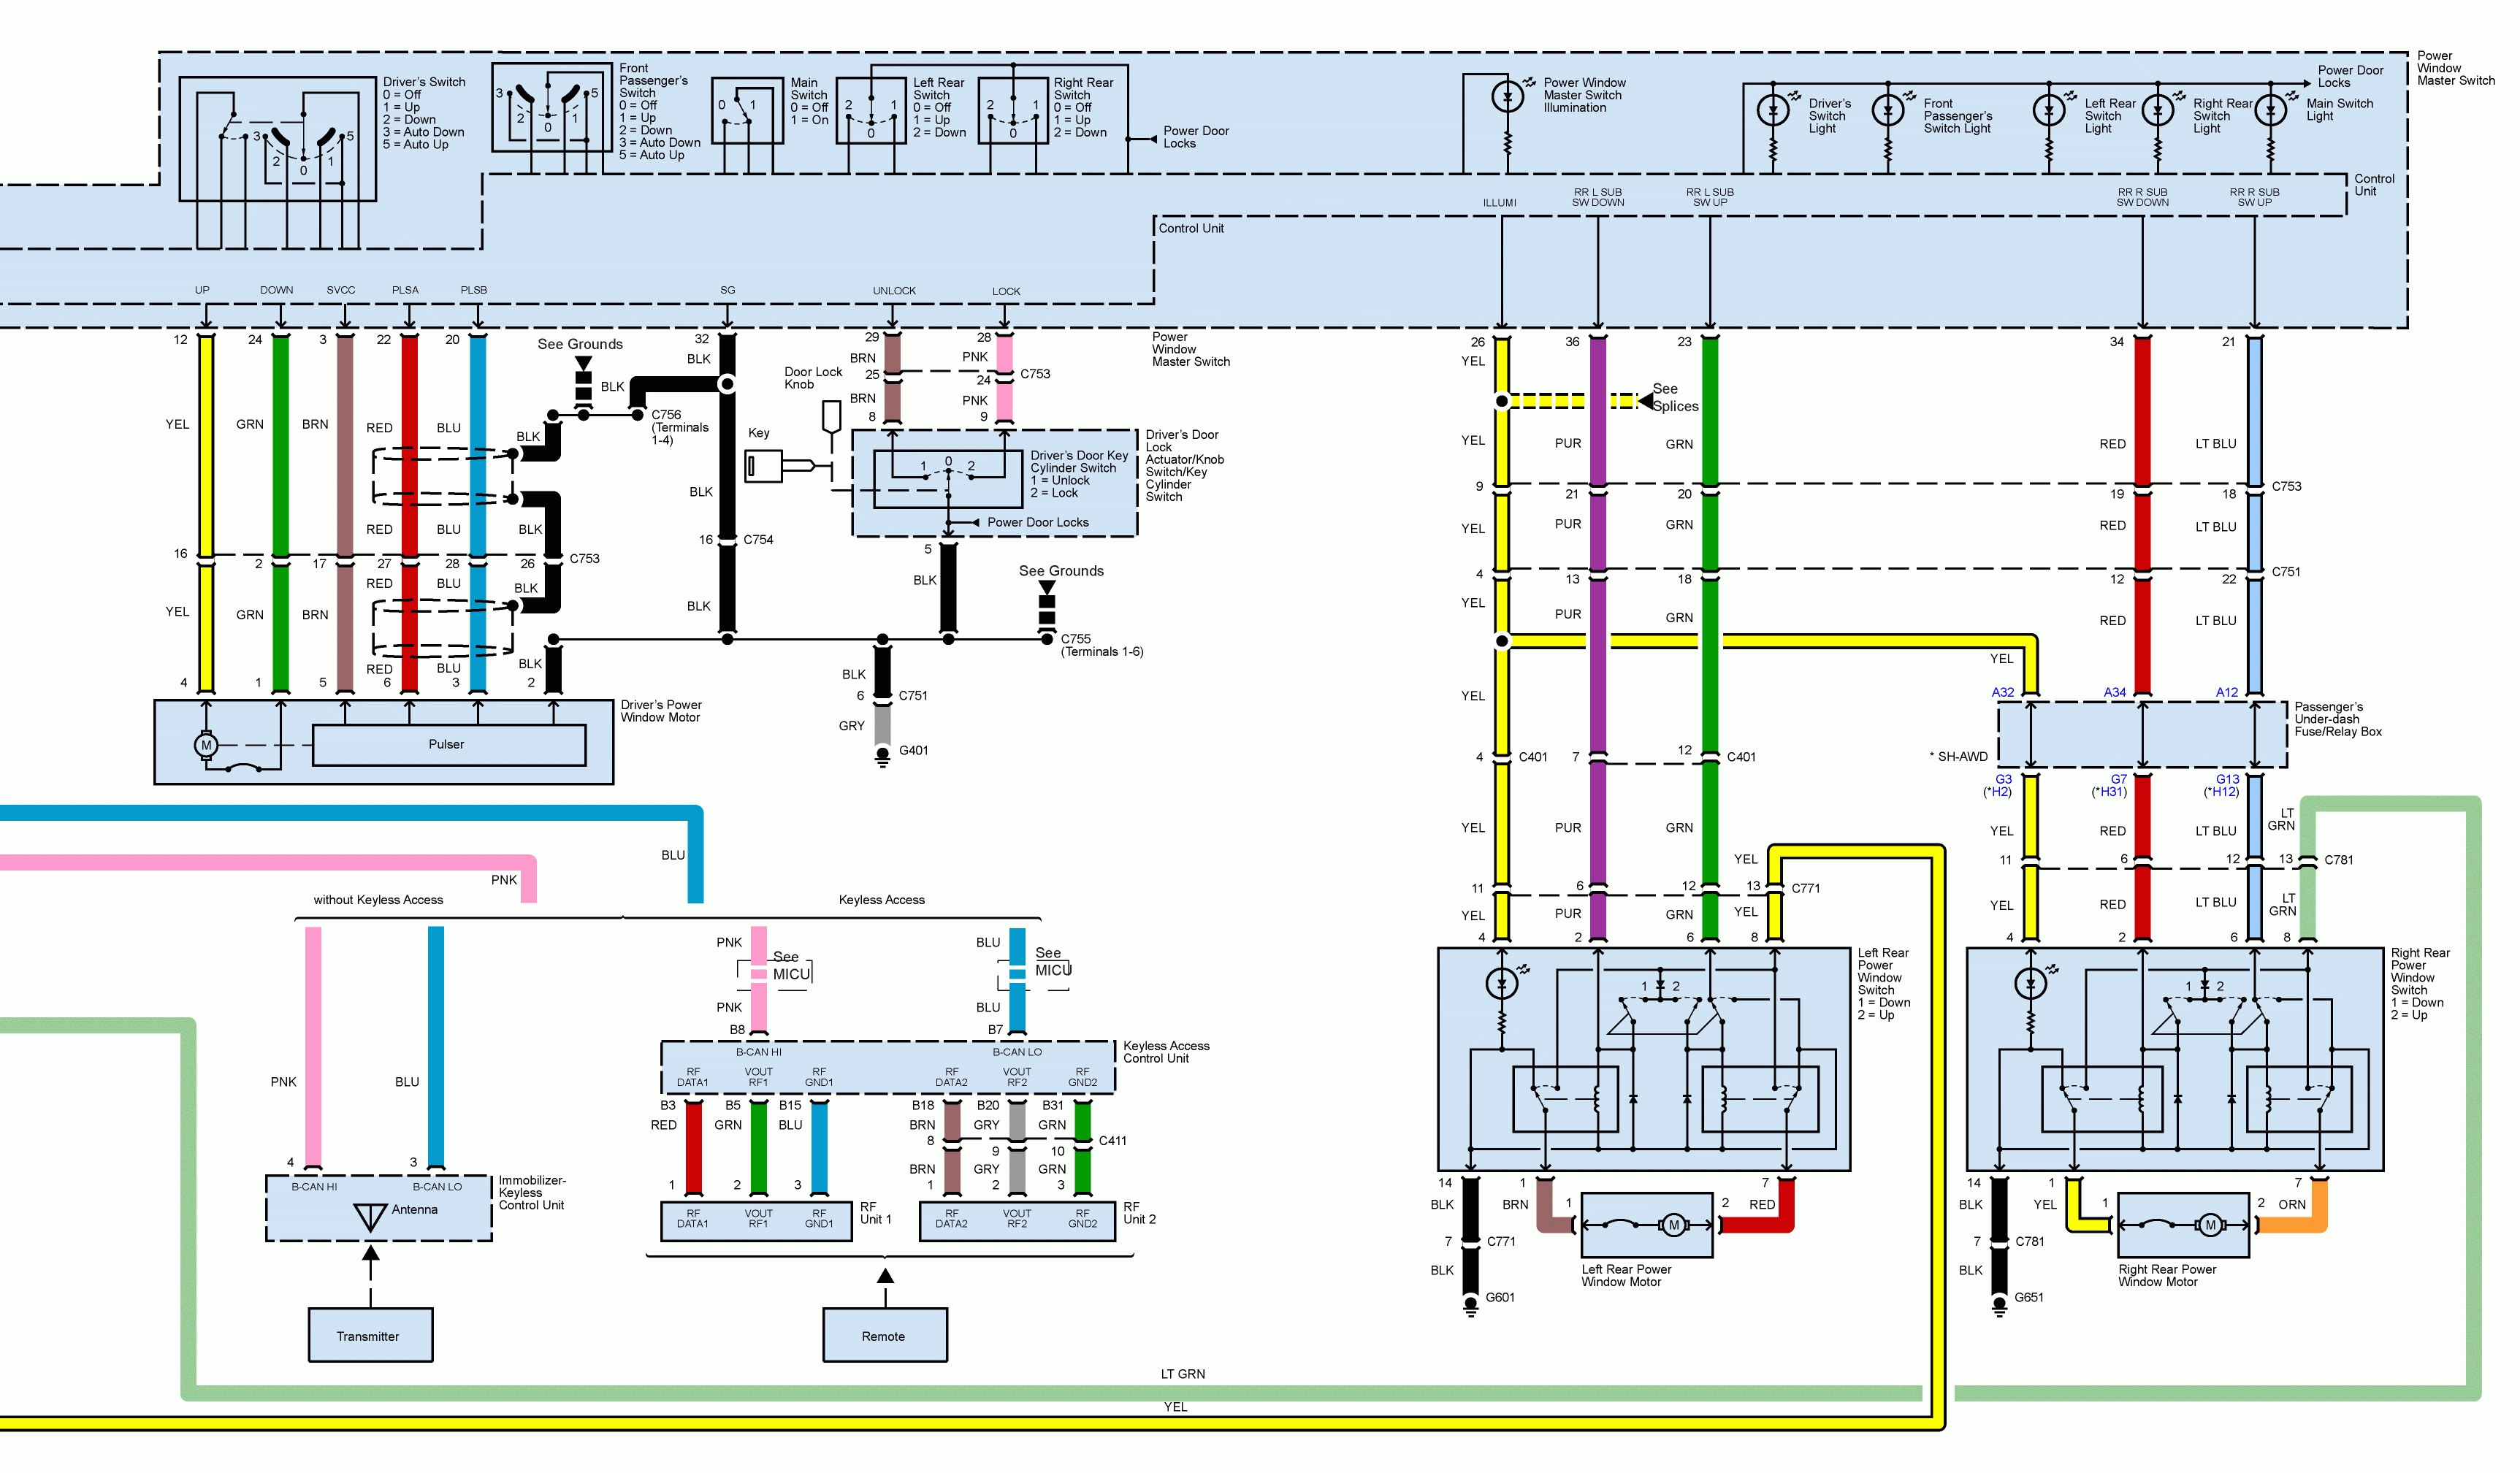 1999 acura cl stereo wiring diagram suzuki lt 125 carburetor tl window electrical diagrams